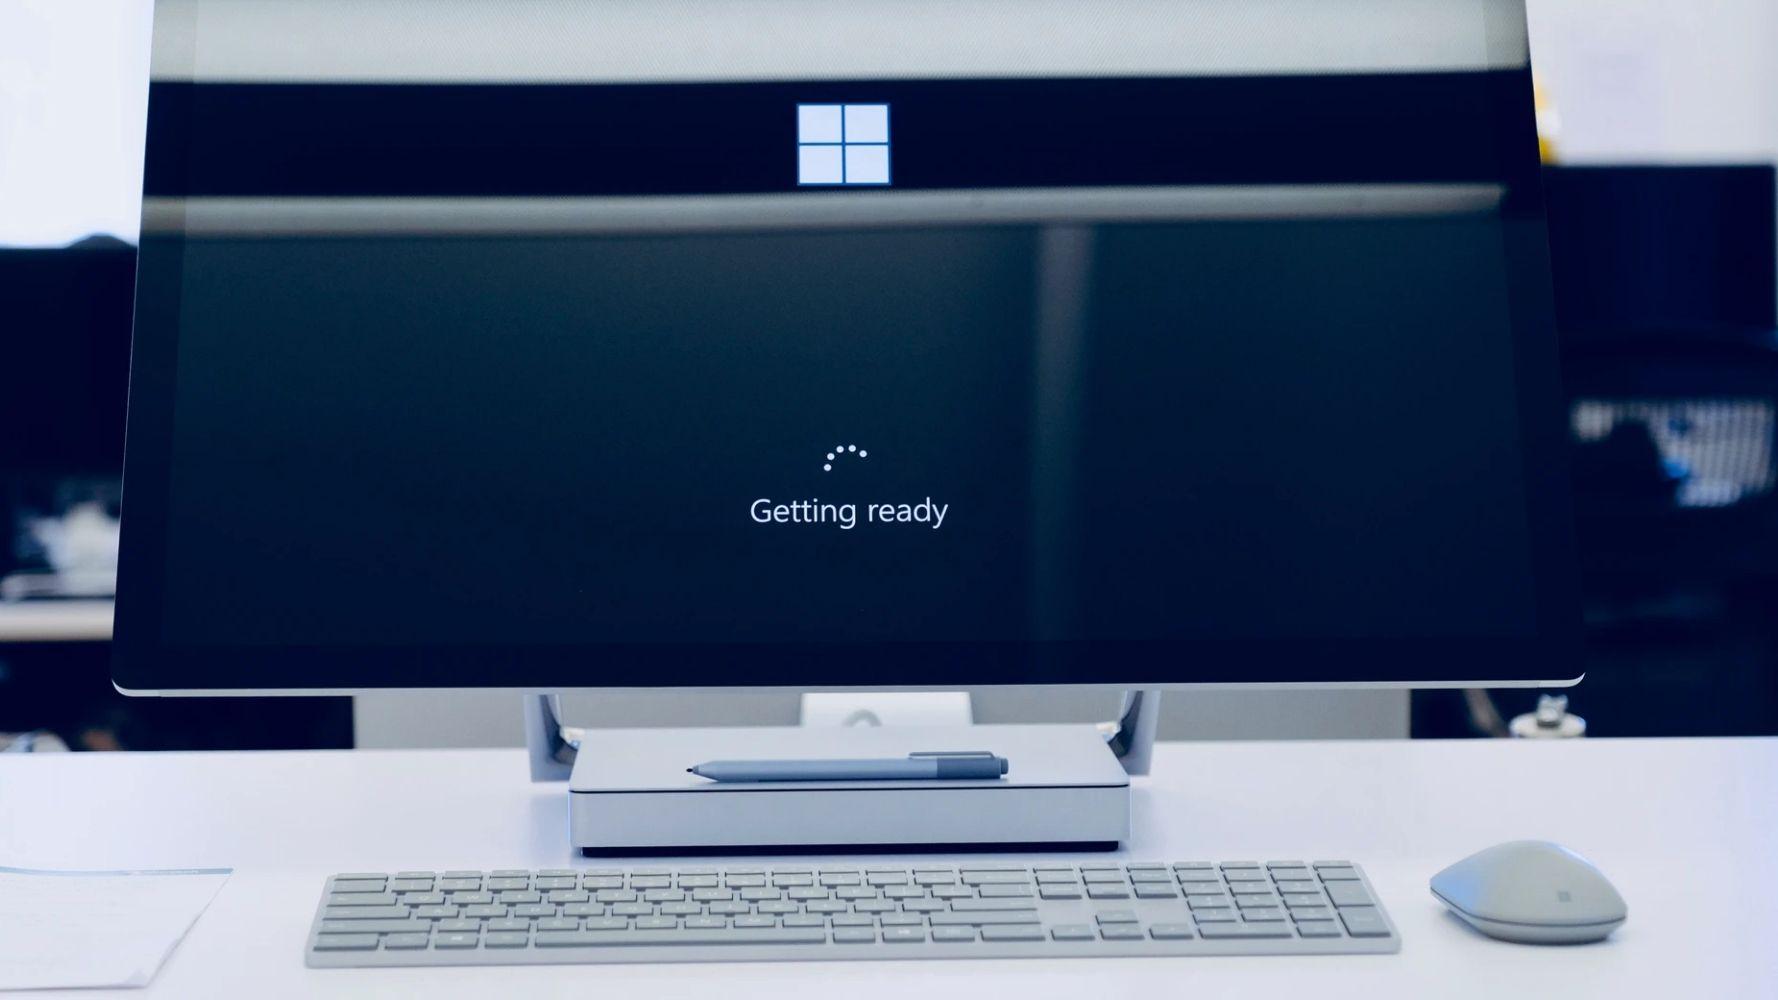 New Version of Windows OS